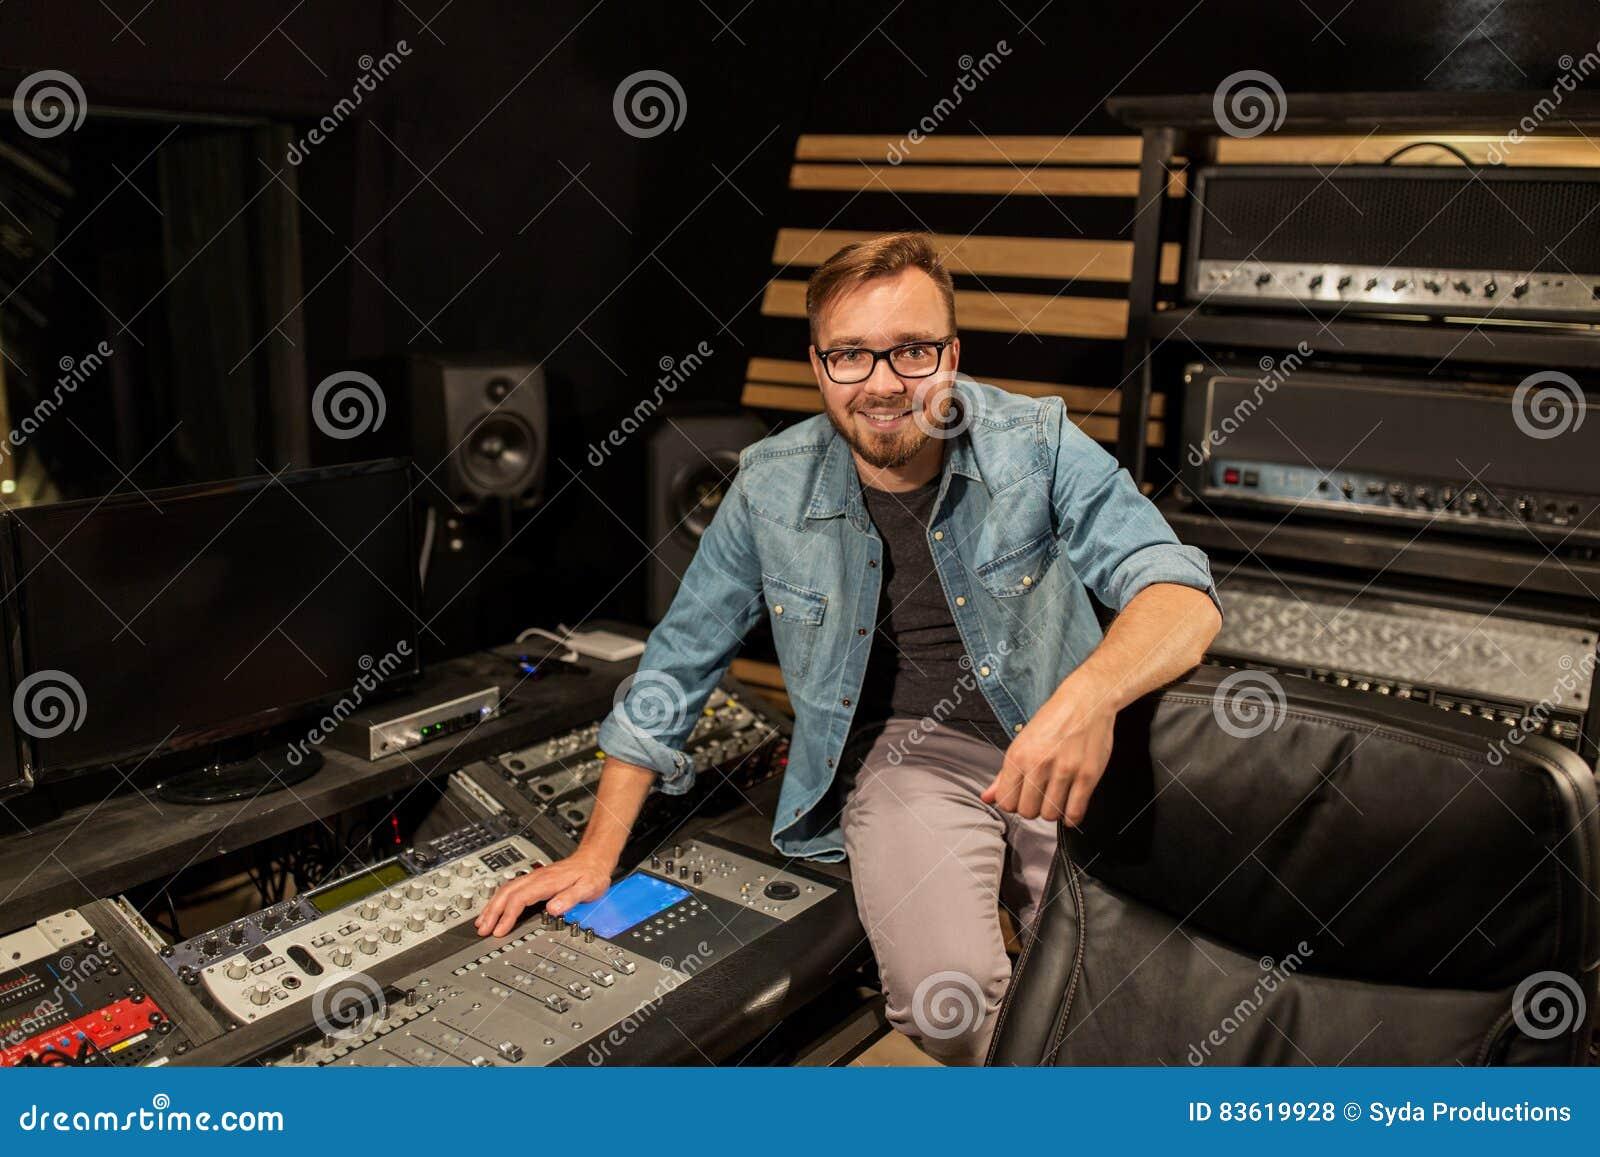 music recording studio near me